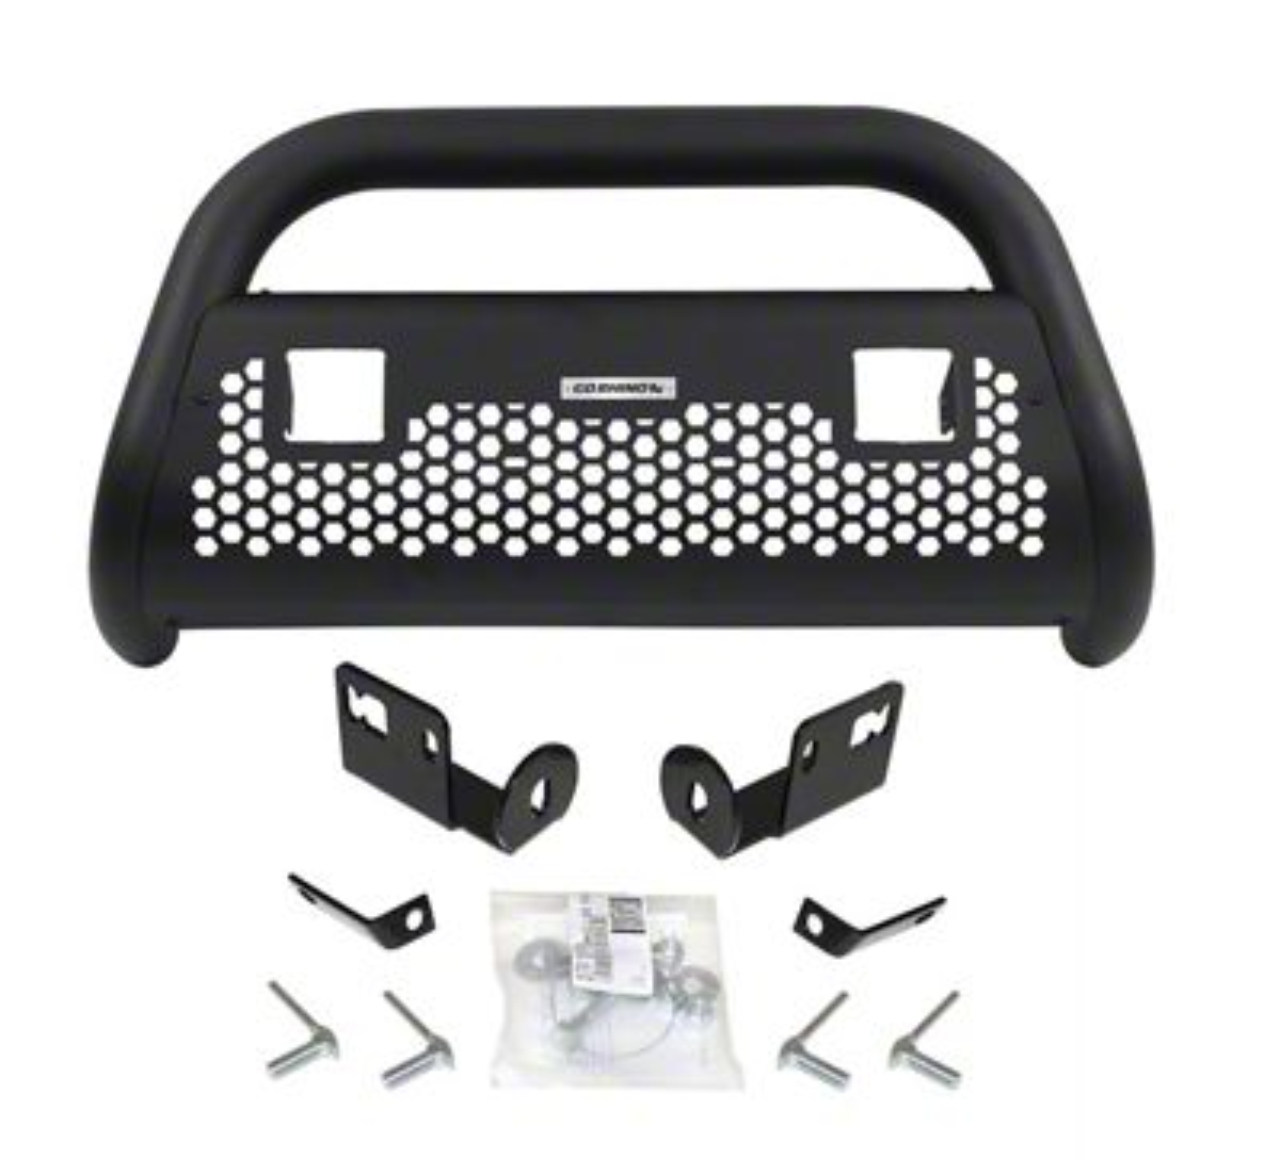 Go Rhino RC2 LR Bull Bar w/ Two LED Cube Light Mounting Brackets - Textured Black (04-08 F-150)